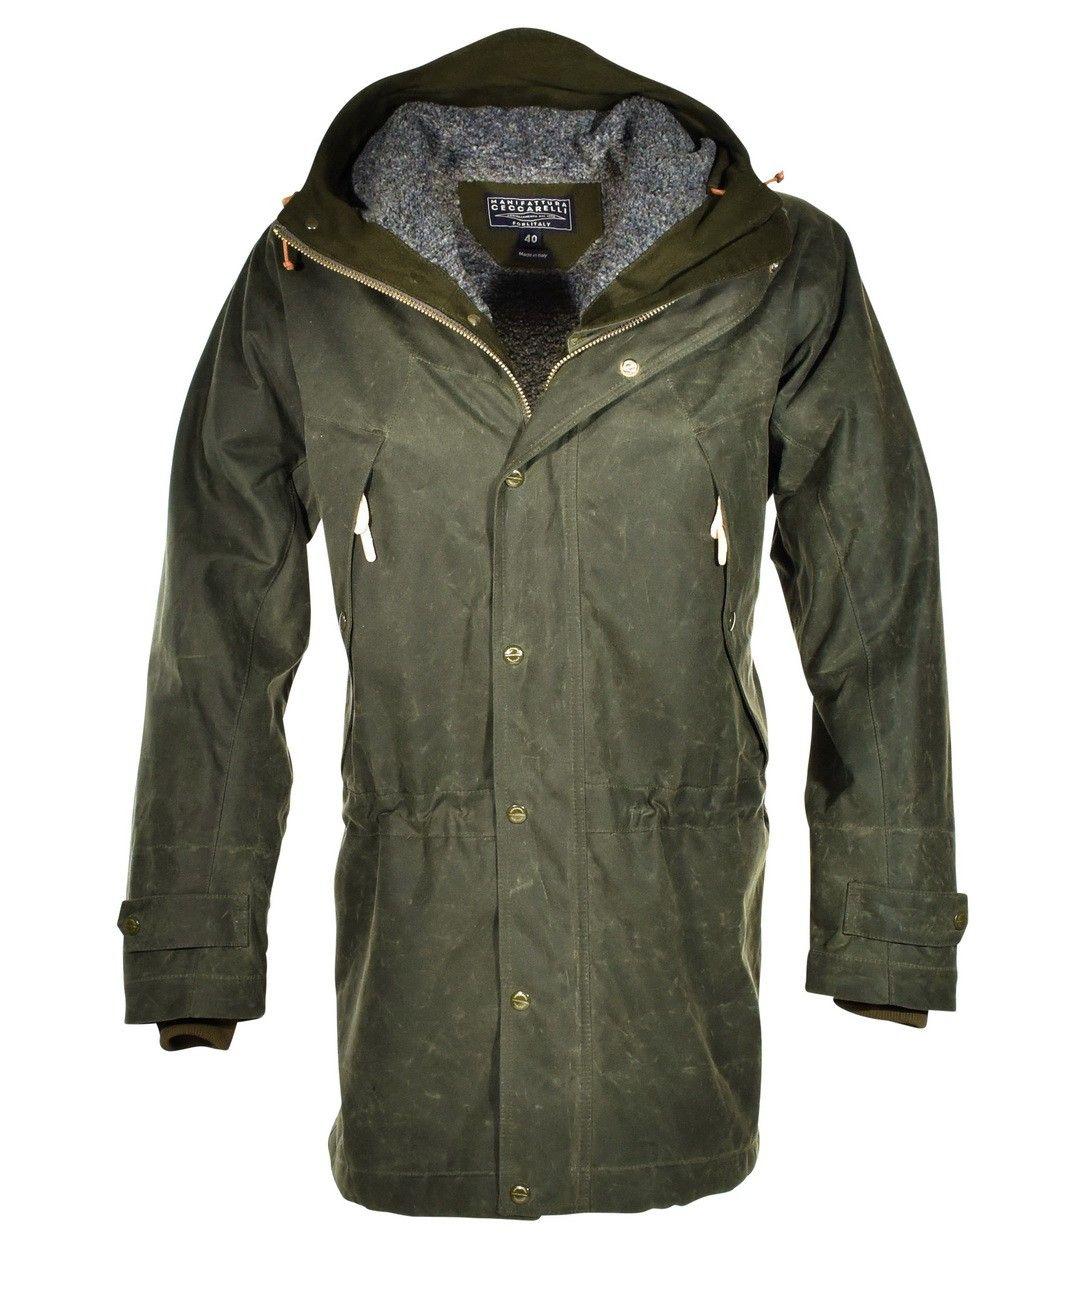 MANIFATTURA CECCARELLI - Herren Jacke - Long Mountain Jacket - Dark Green